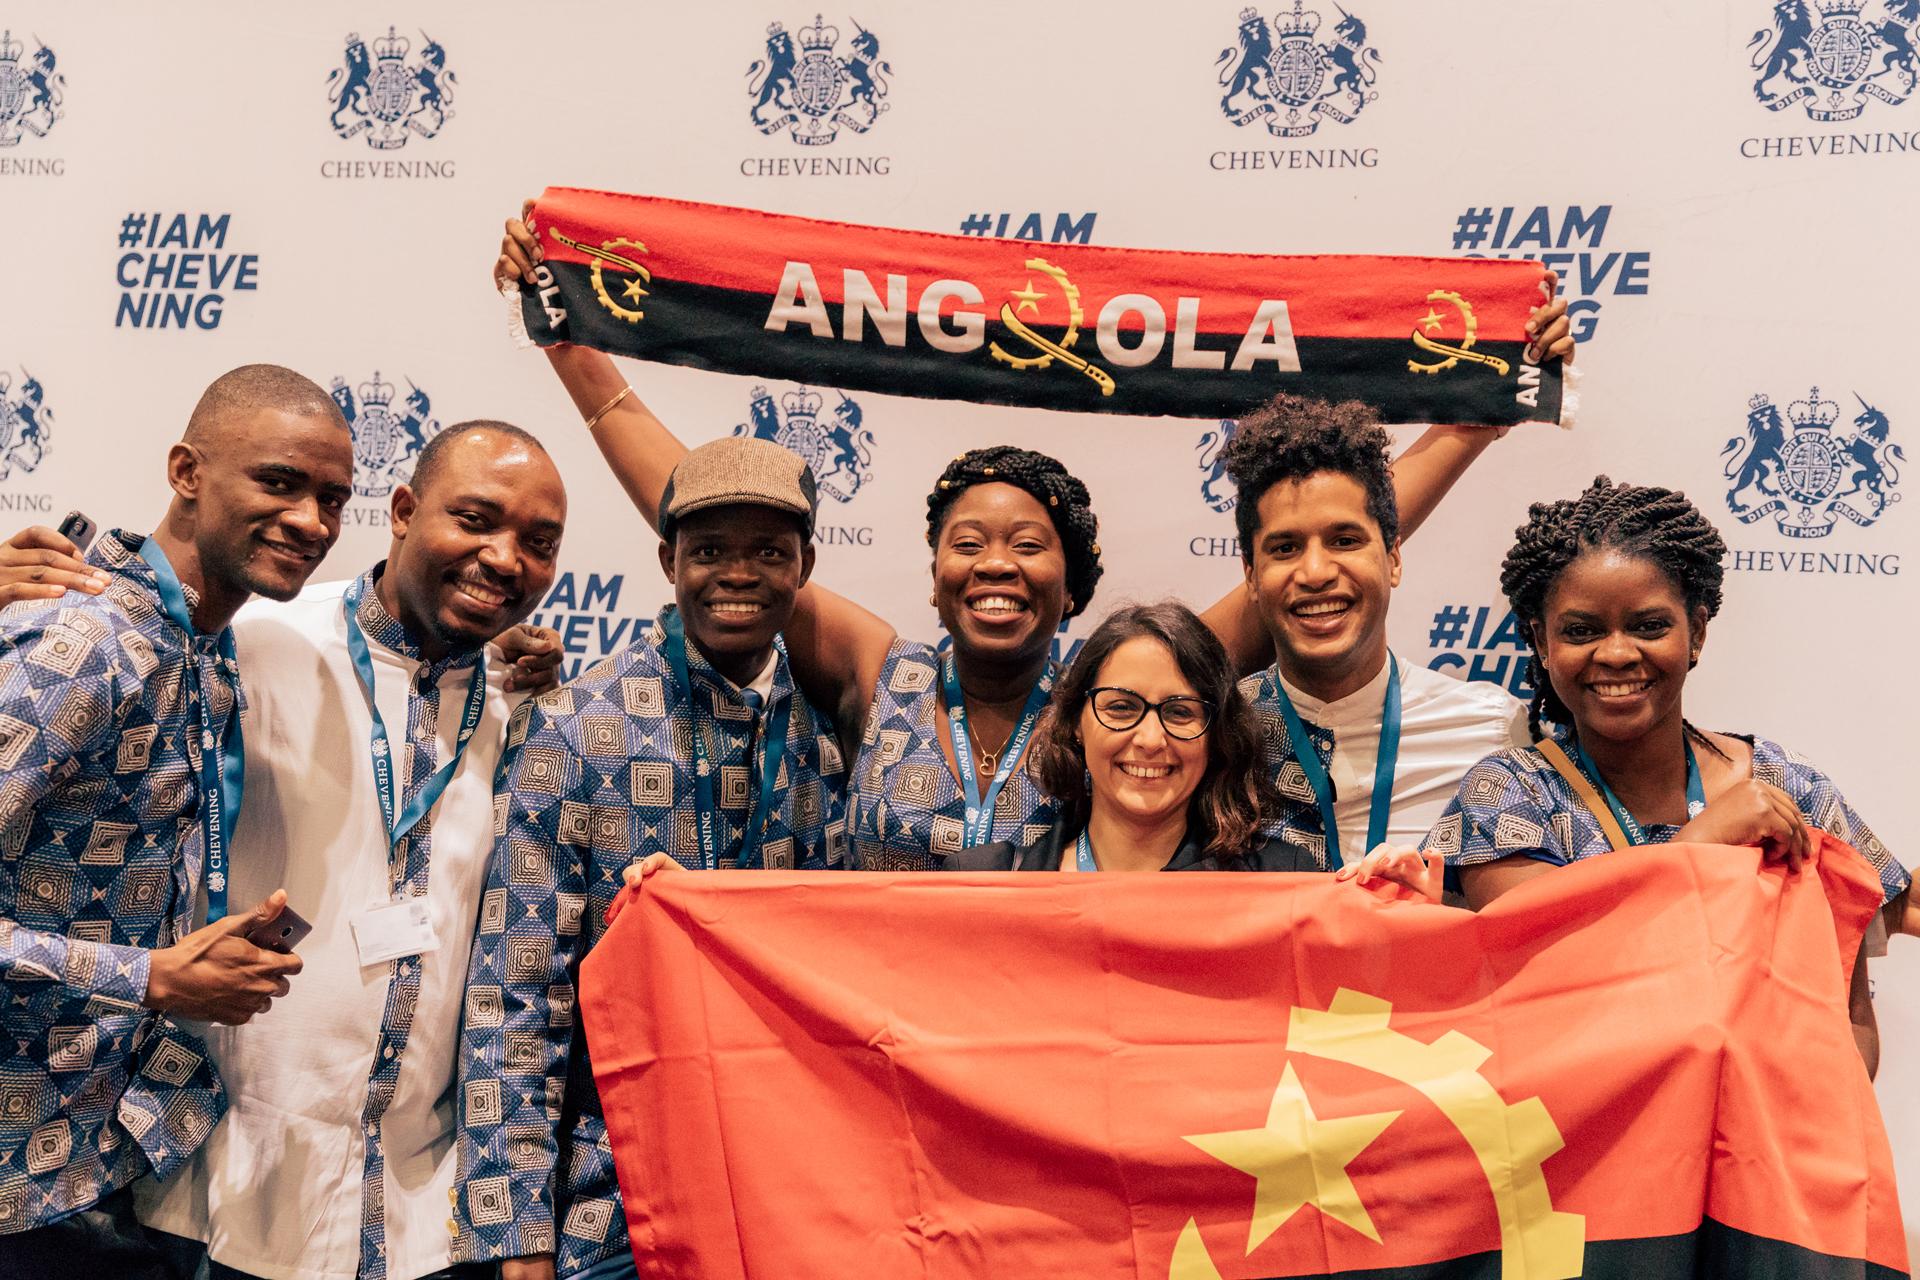 Chevening in Angola